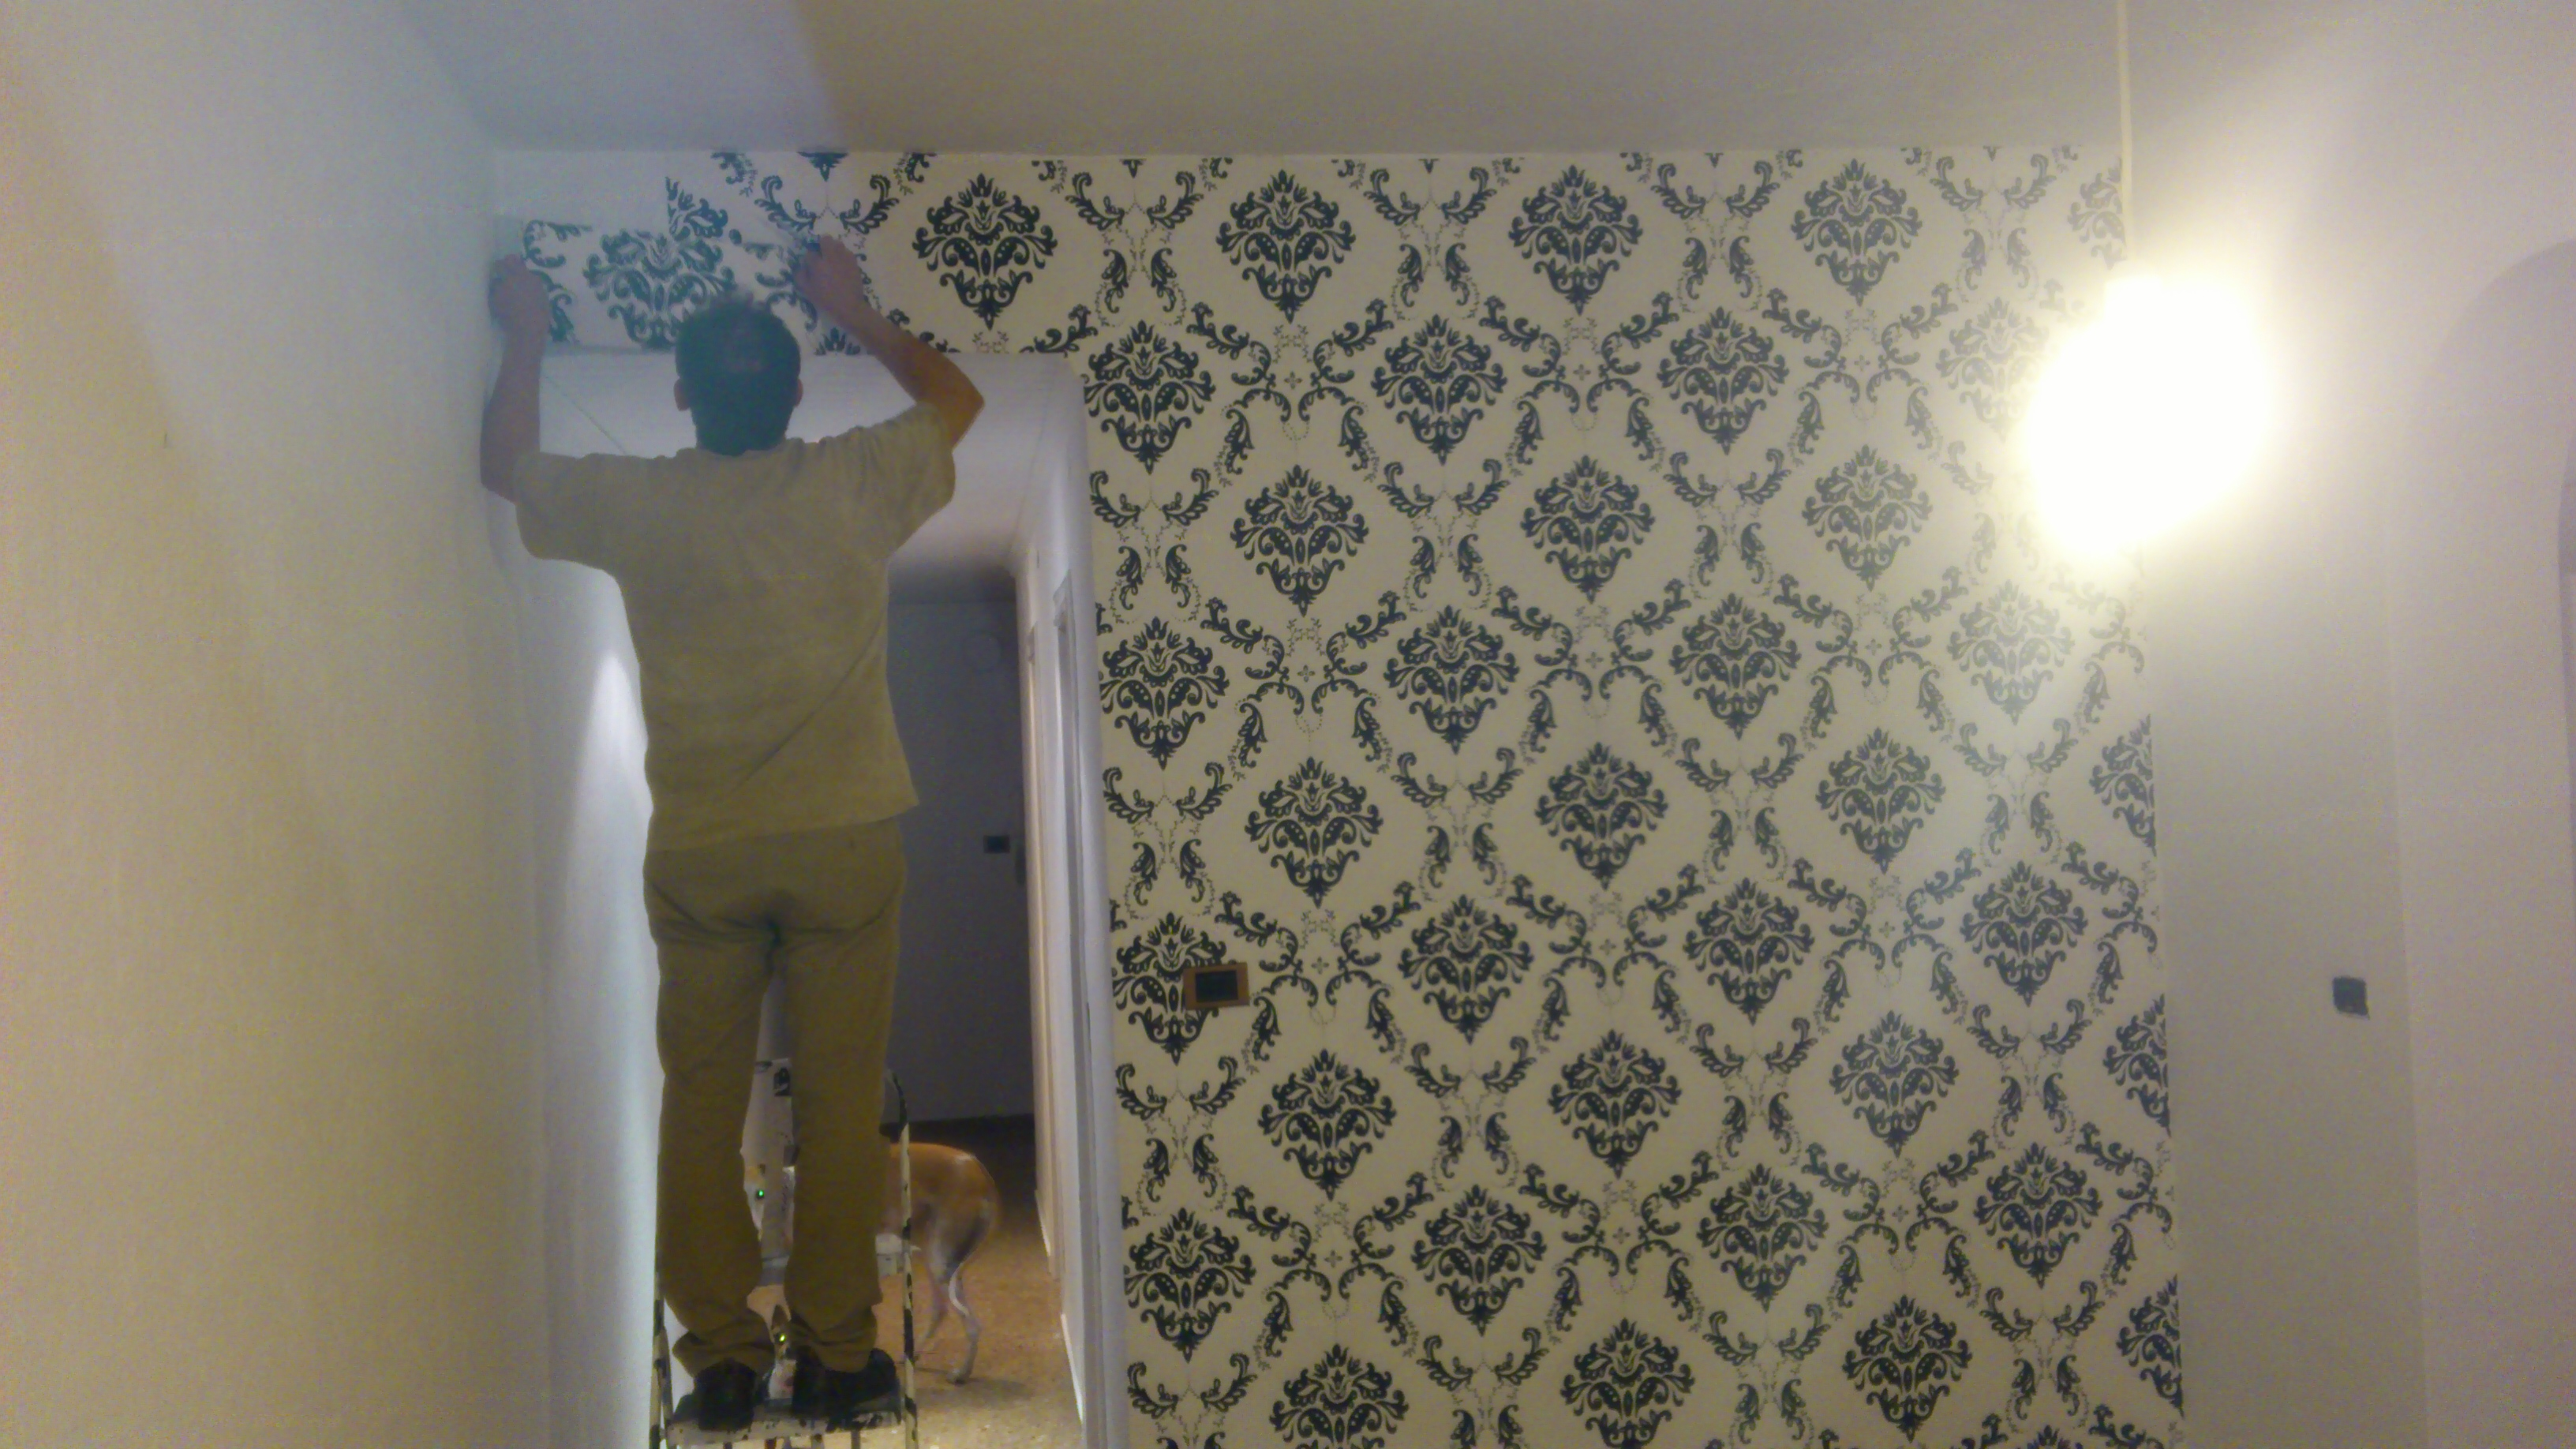 Trastero de azulejos empapelado decorando con poco dinero - Empapelar sobre azulejos ...